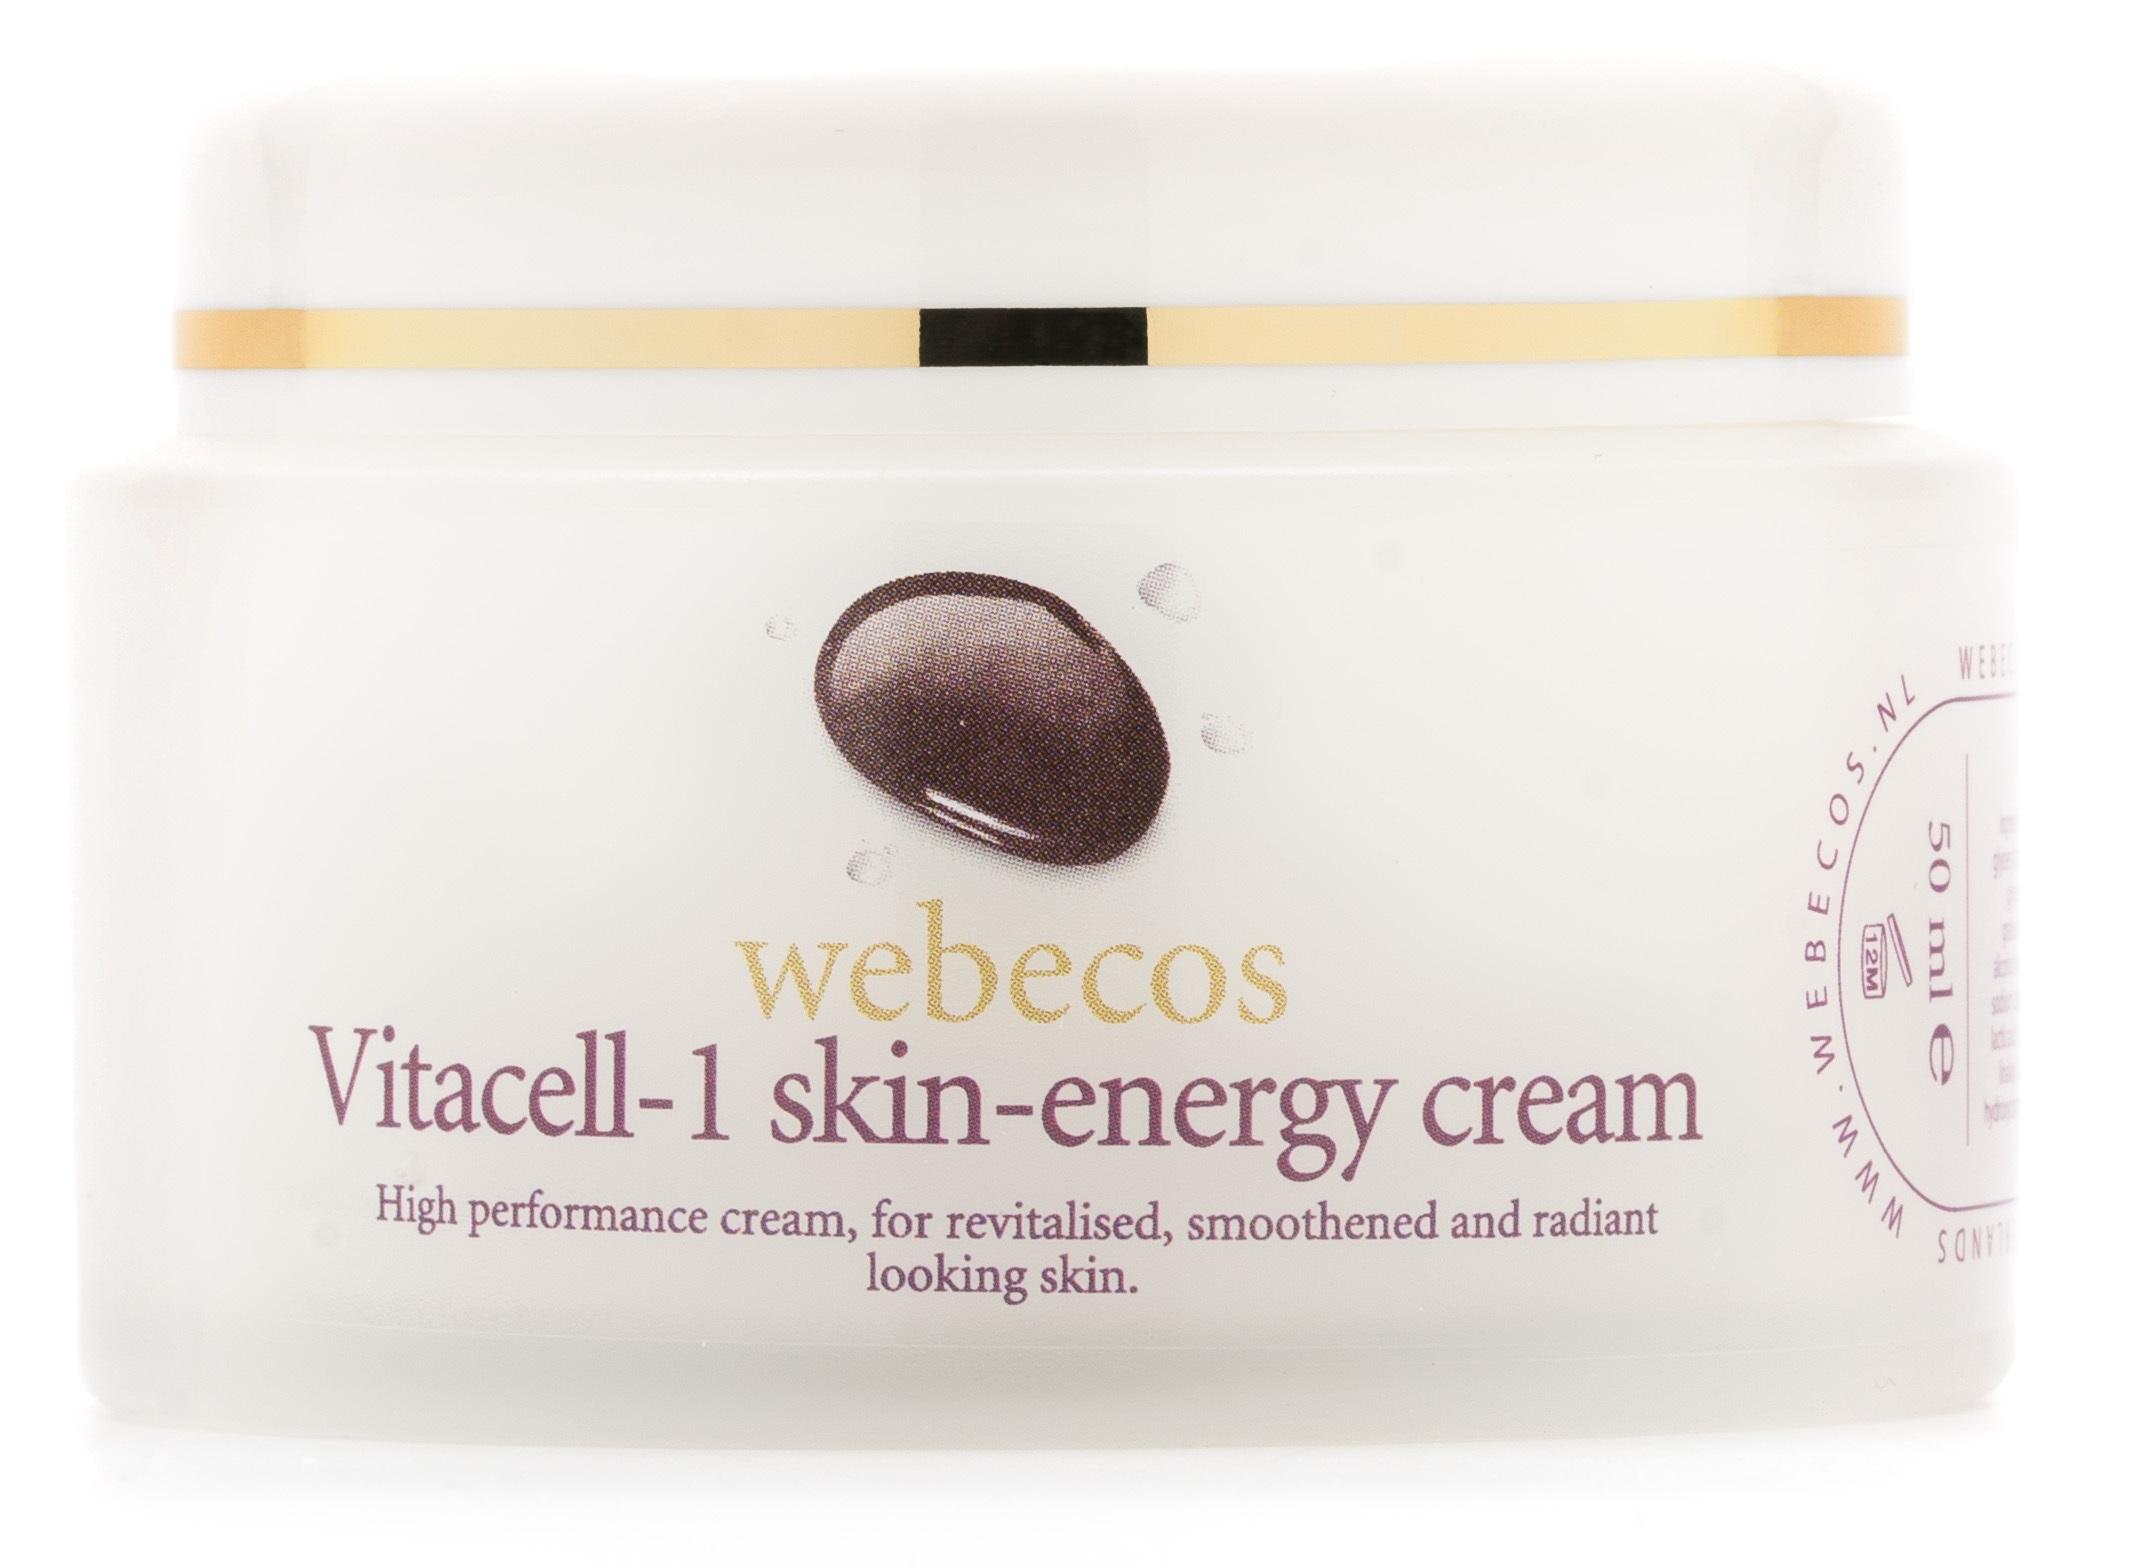 Webecos Vitacell Skin Energy Cream kopie - STRALENDE EN MOOIE HUID MET VITACELL RADIANCE